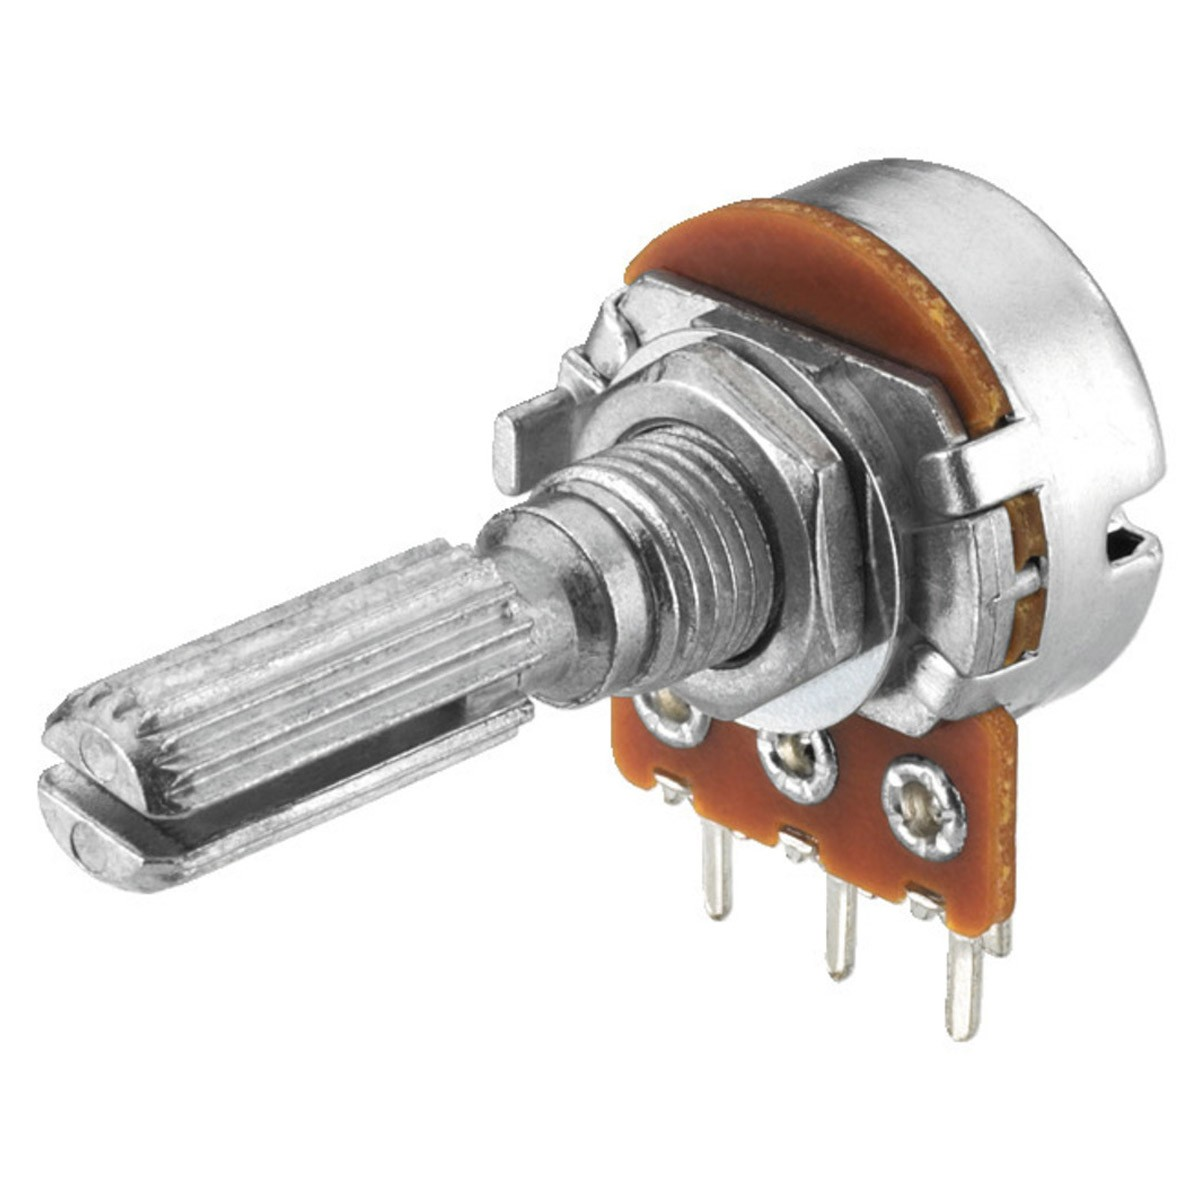 Mono potentiometer VRA-100M50 50kohm